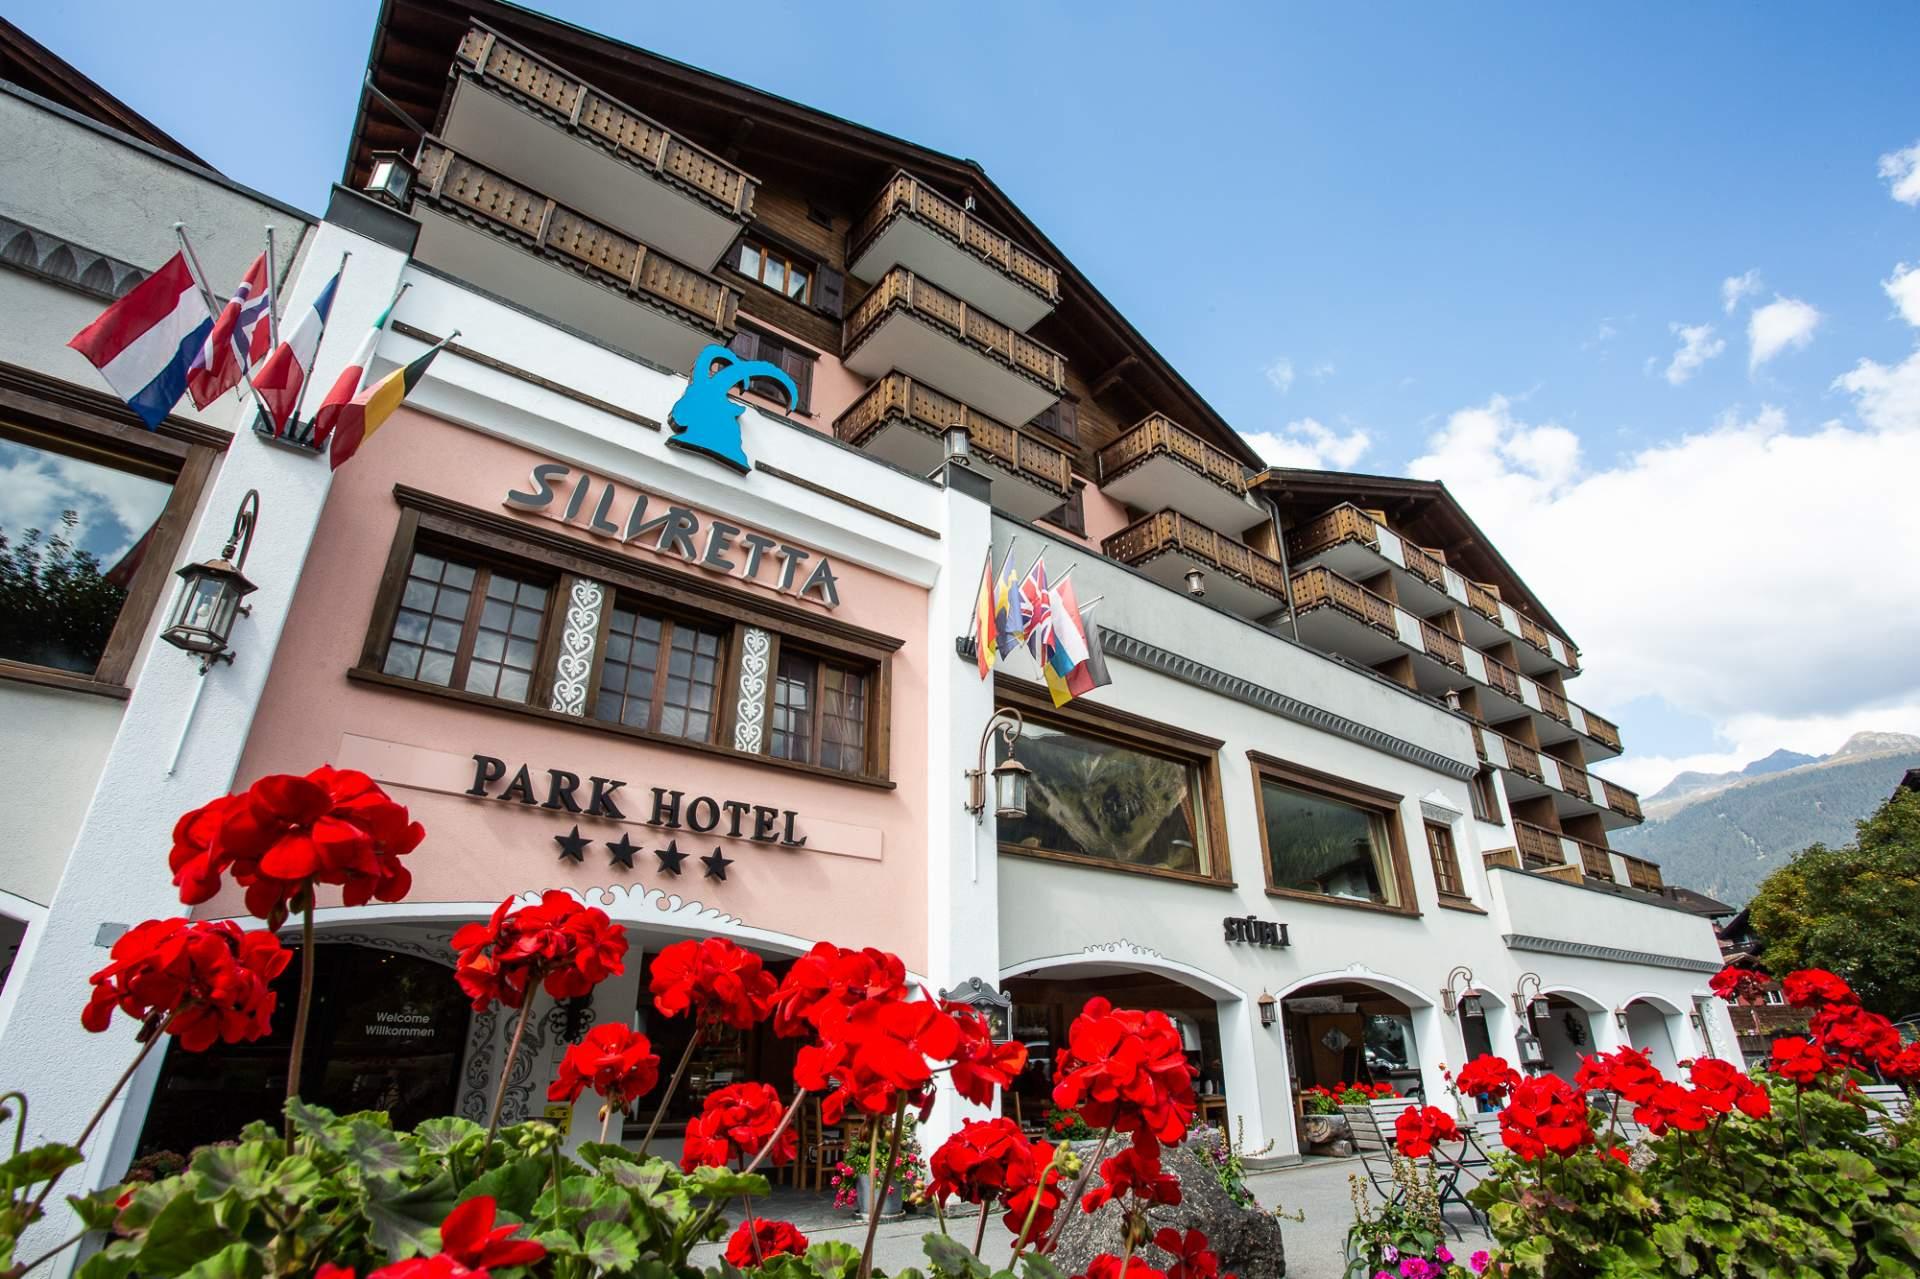 Busreis meerdaagse Klosters Zwitserland ©Silvretta Parkhotel